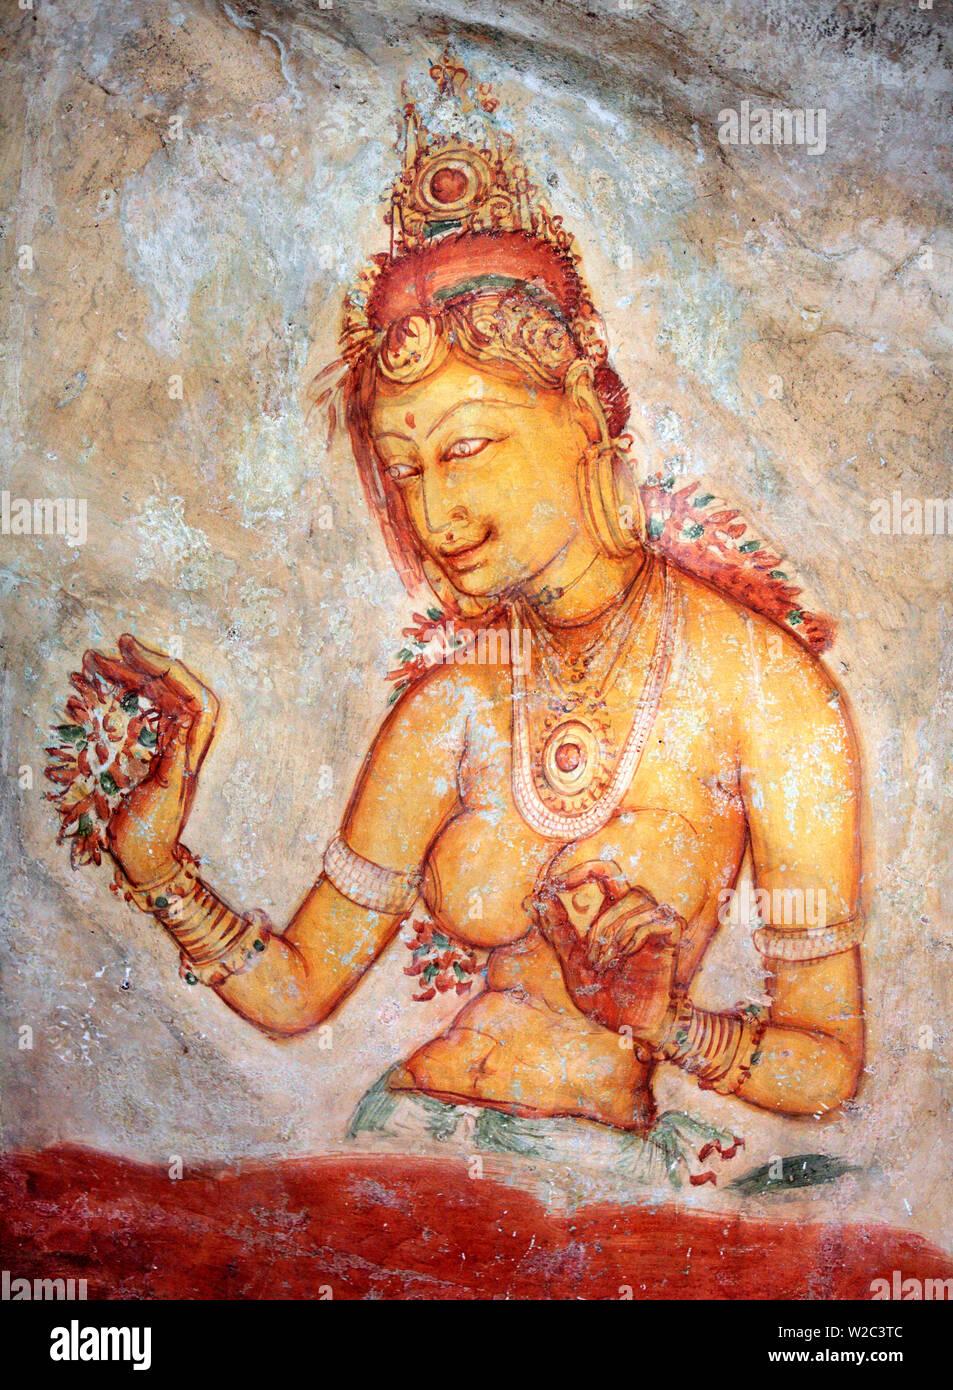 Mural painting (6th century), Sigiriya, Sri Lanka - Stock Image